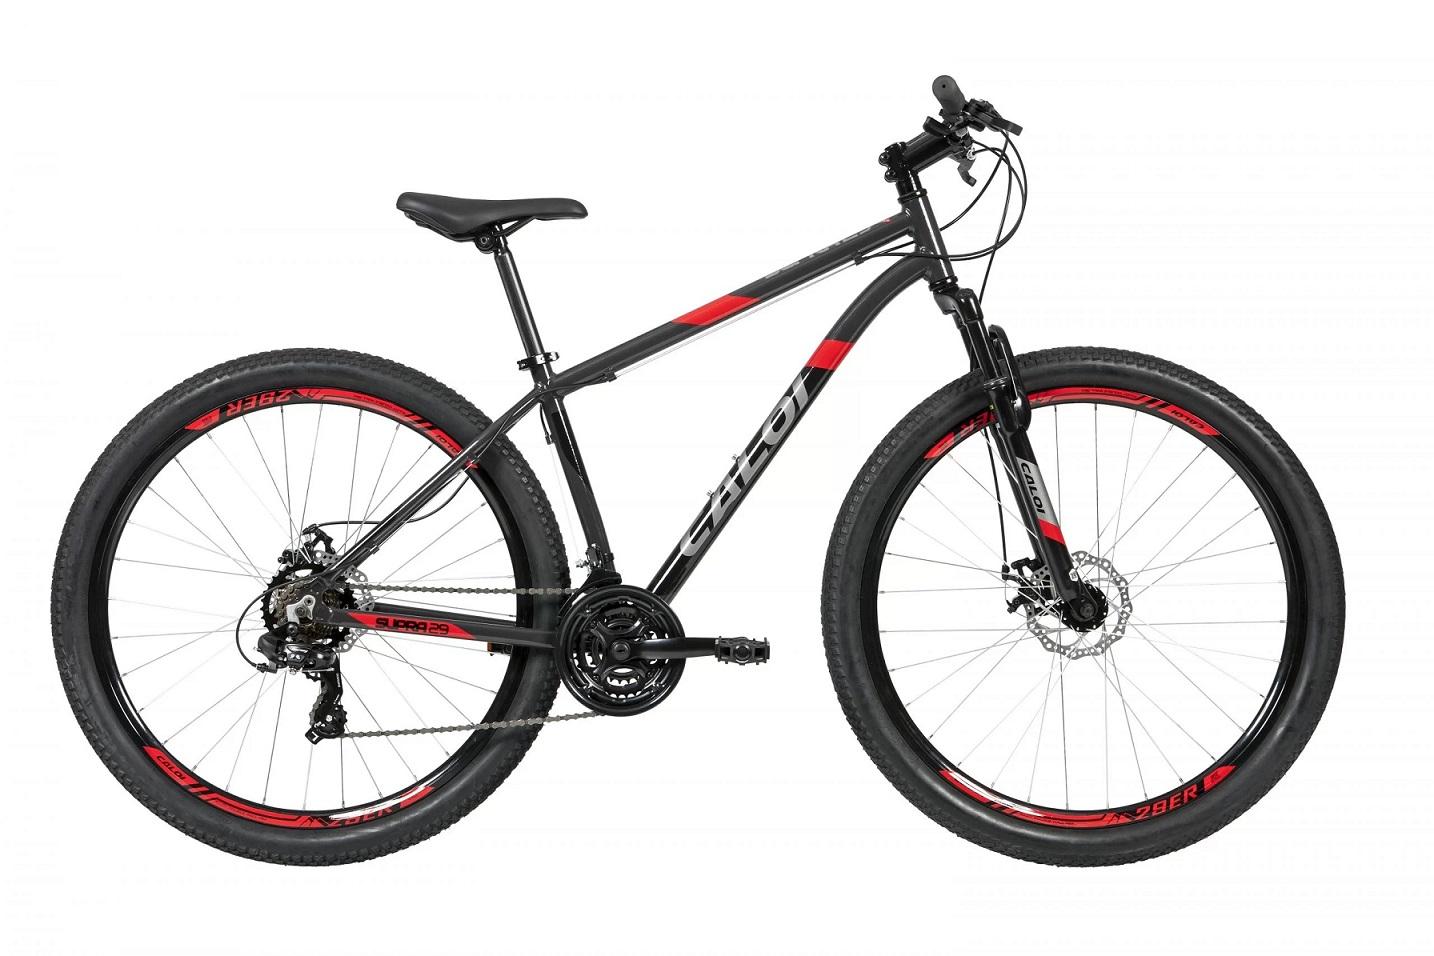 Bicicleta Aro 29 Caloi Supra 21v Shimano 2021 - Cinza Chumbo